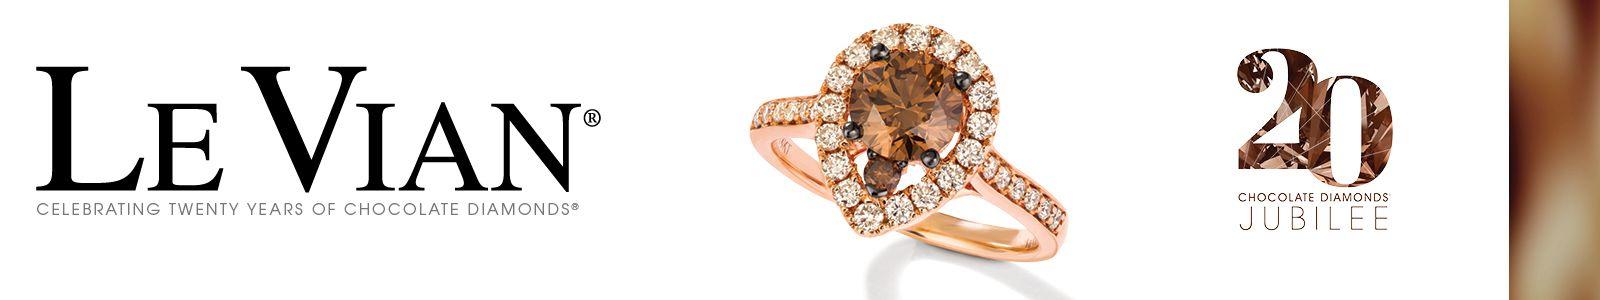 Le Vian, Celebrating Twenty Years of Chocolate Diamonds